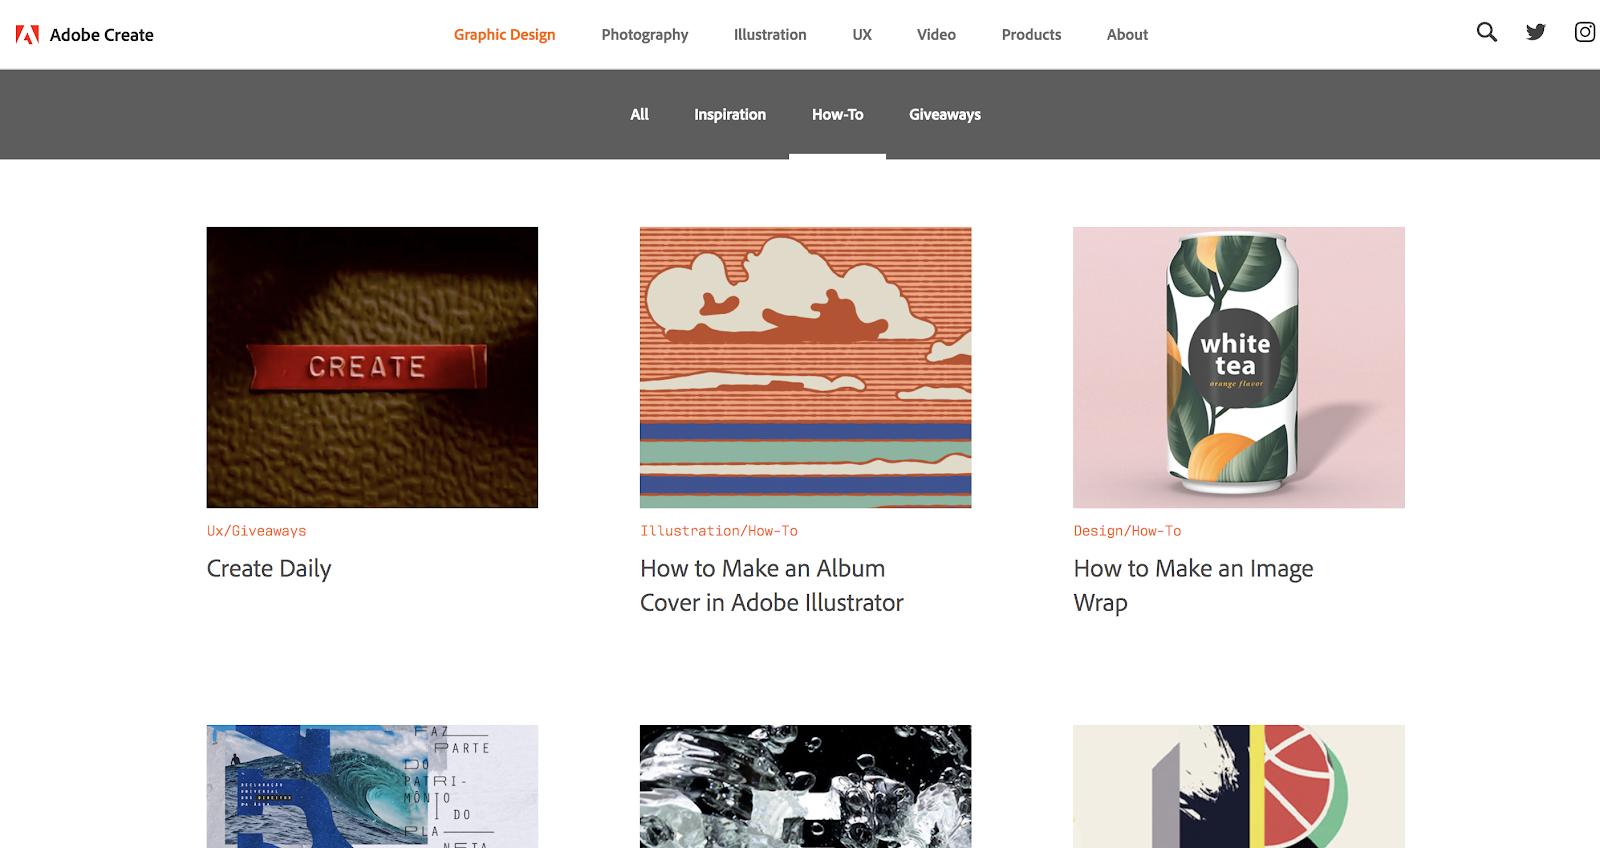 Adobe Create Homepage Screenshot (Blog Layout Examples)